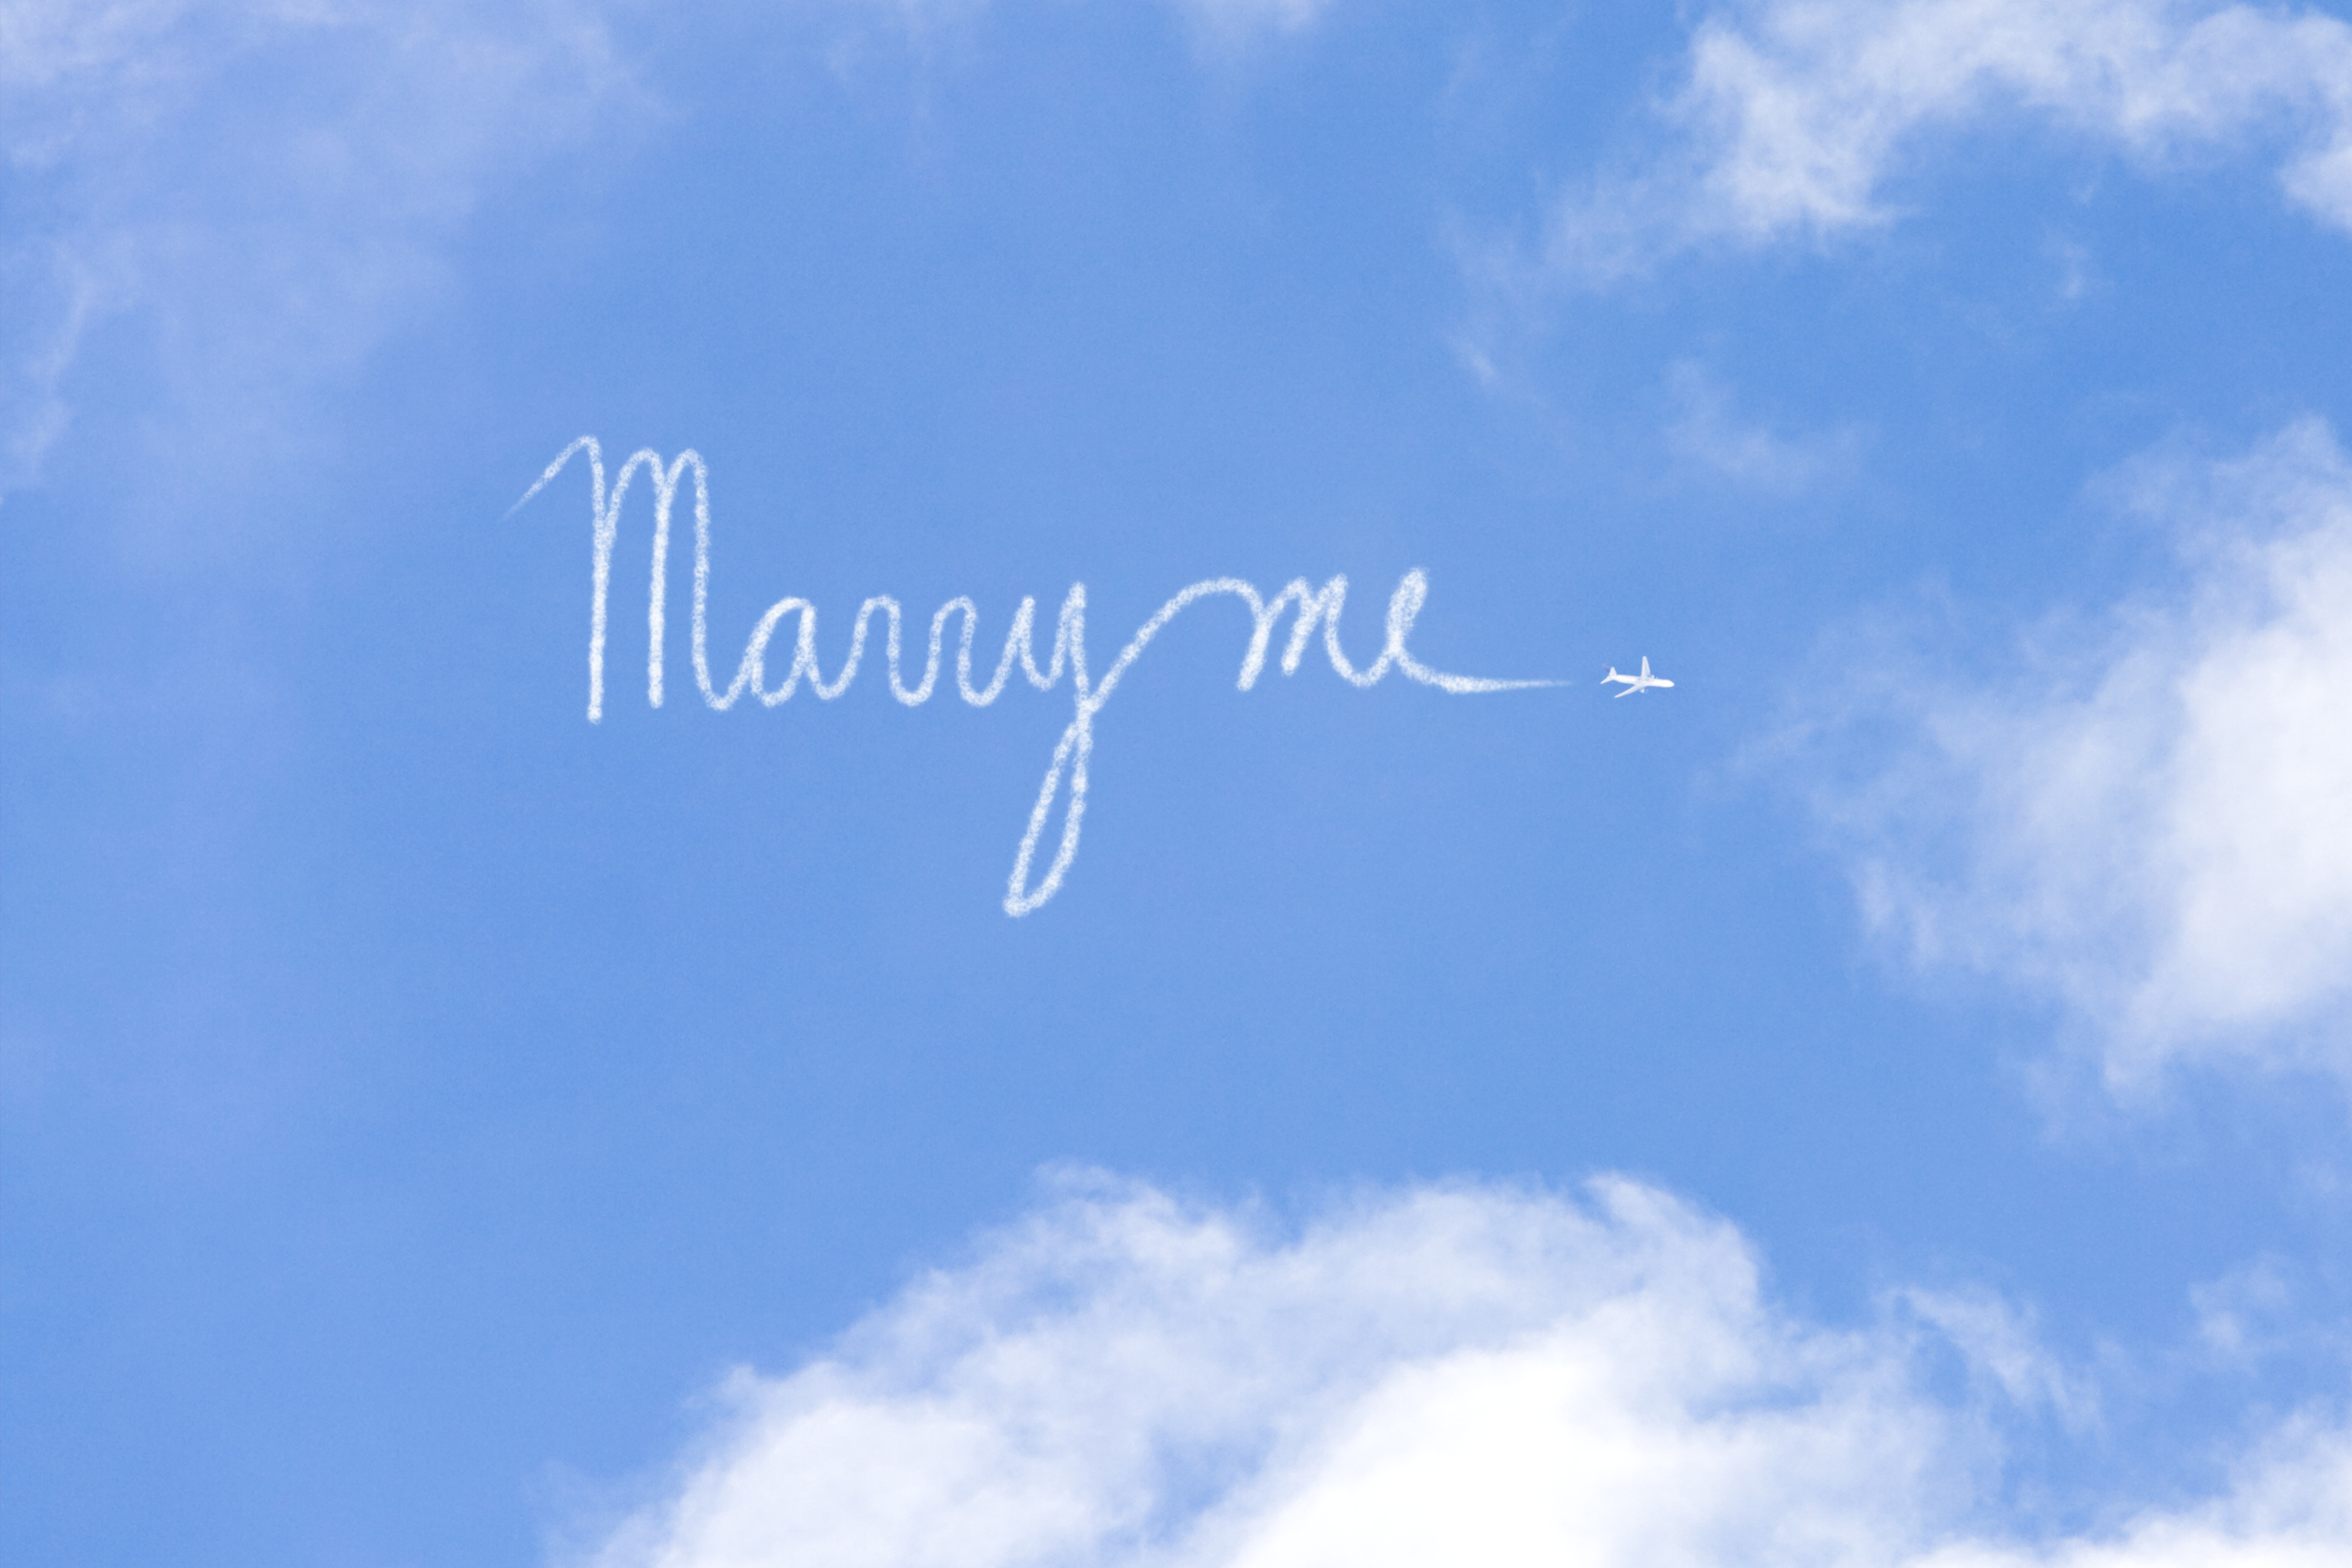 skywriting proposal